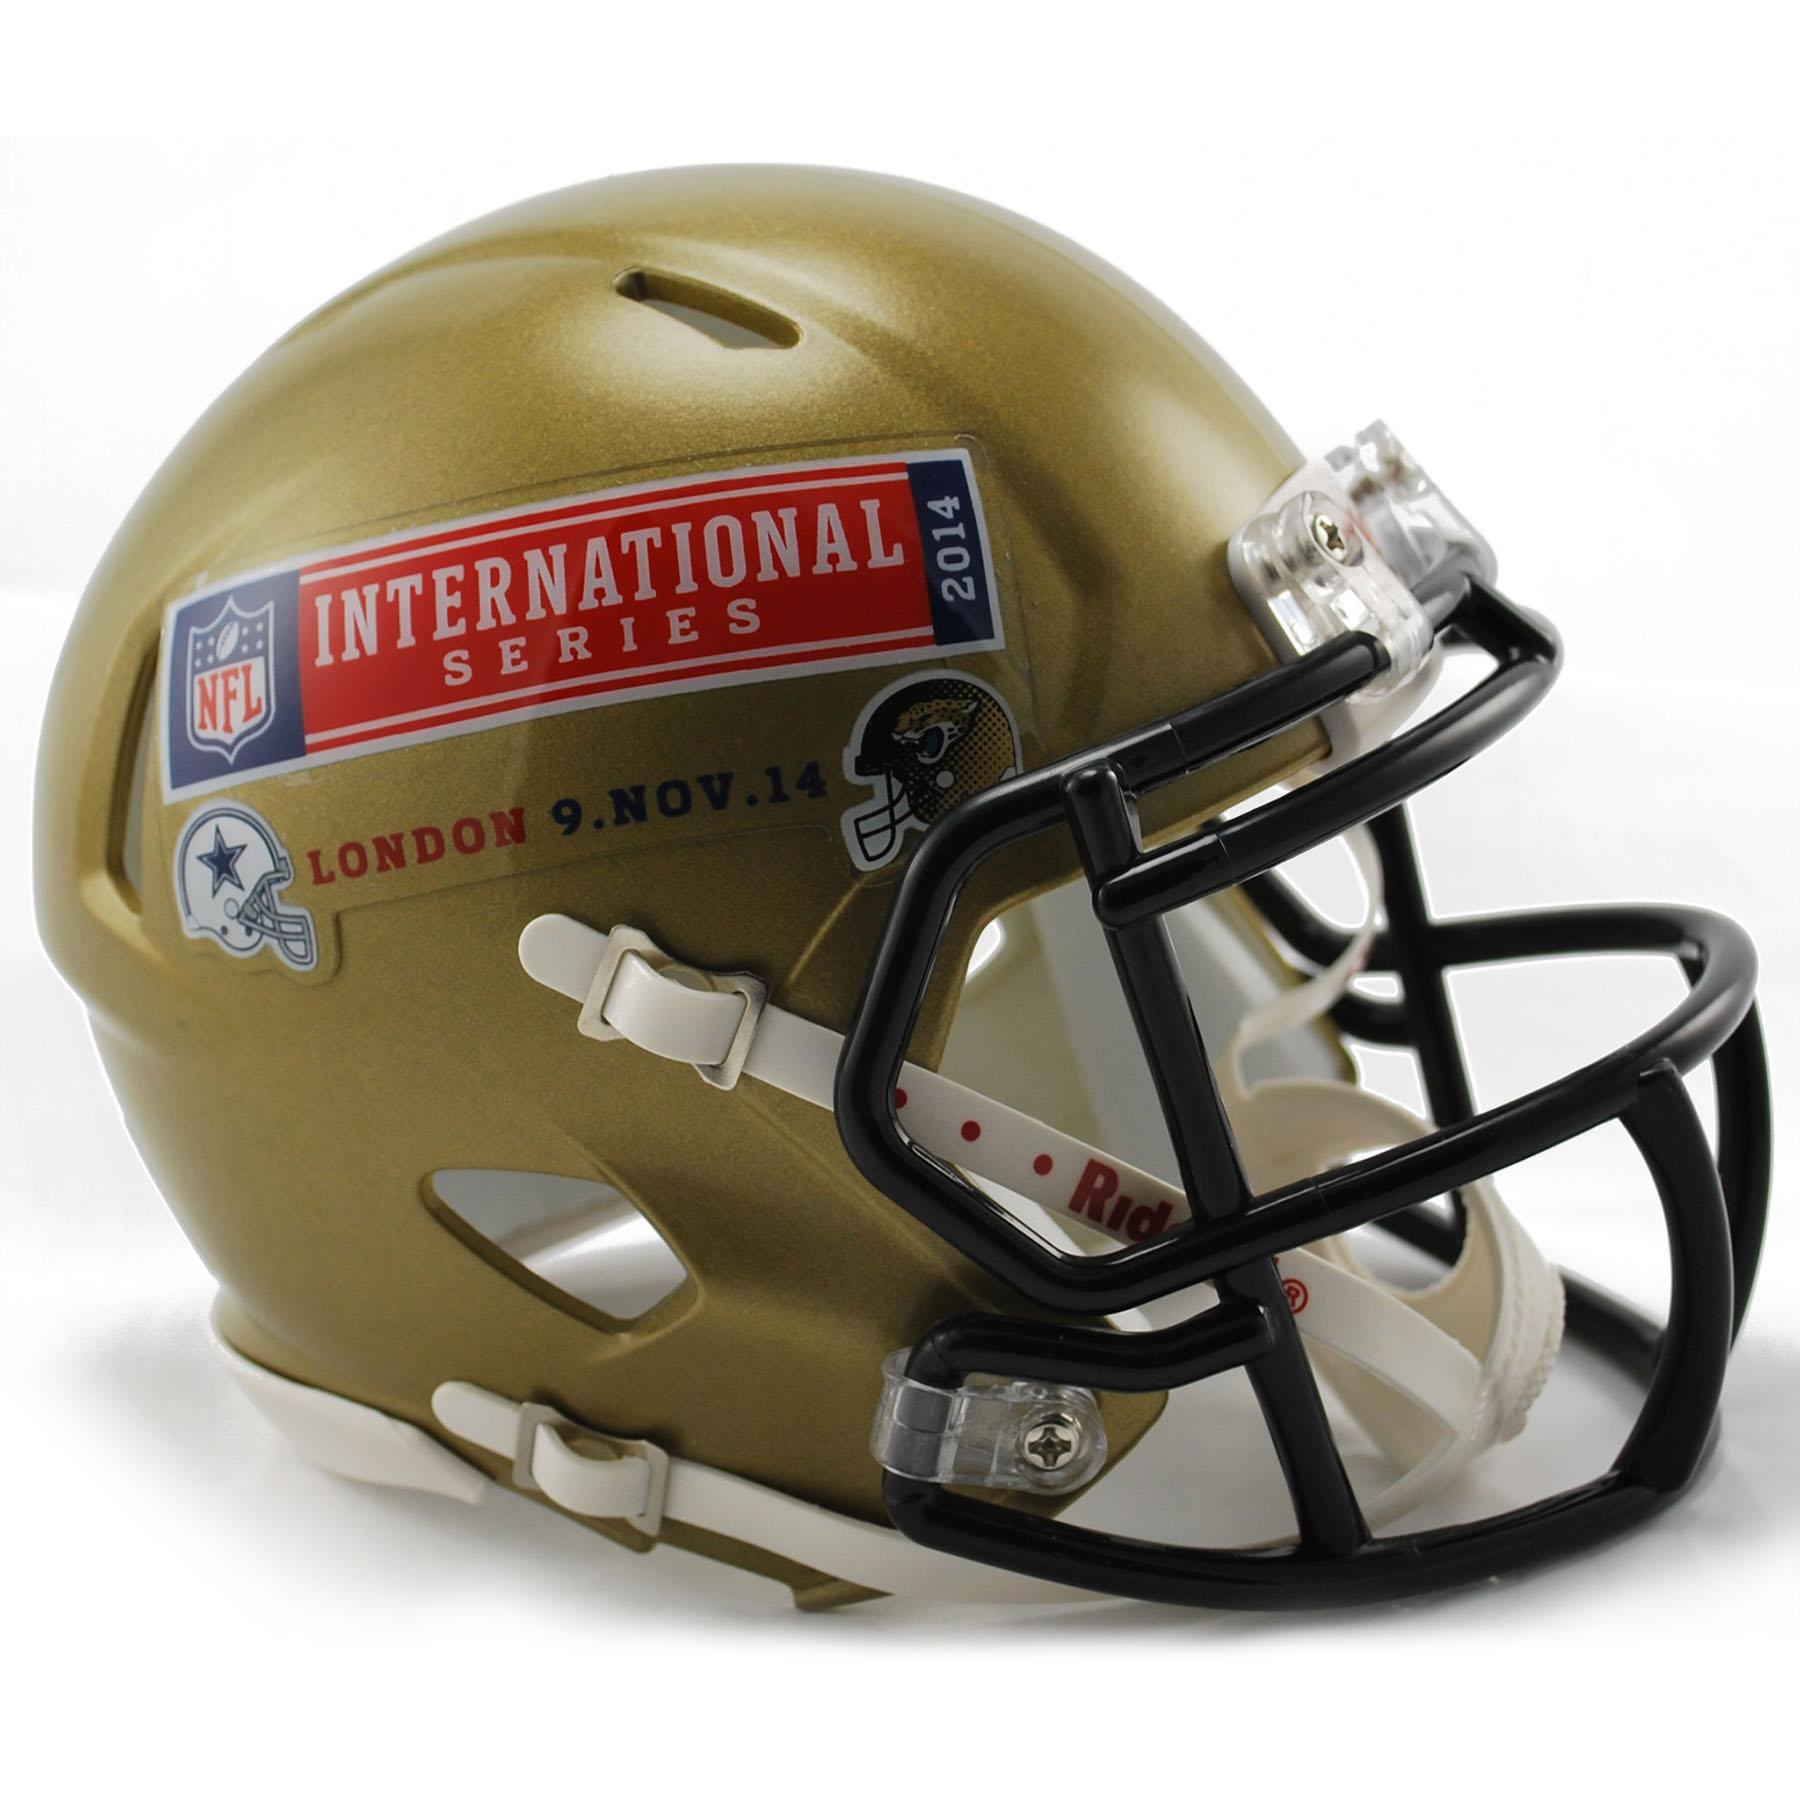 NFL Cowboys Vs Jaguars International Series Game 11 VSR4 Mini Helmet